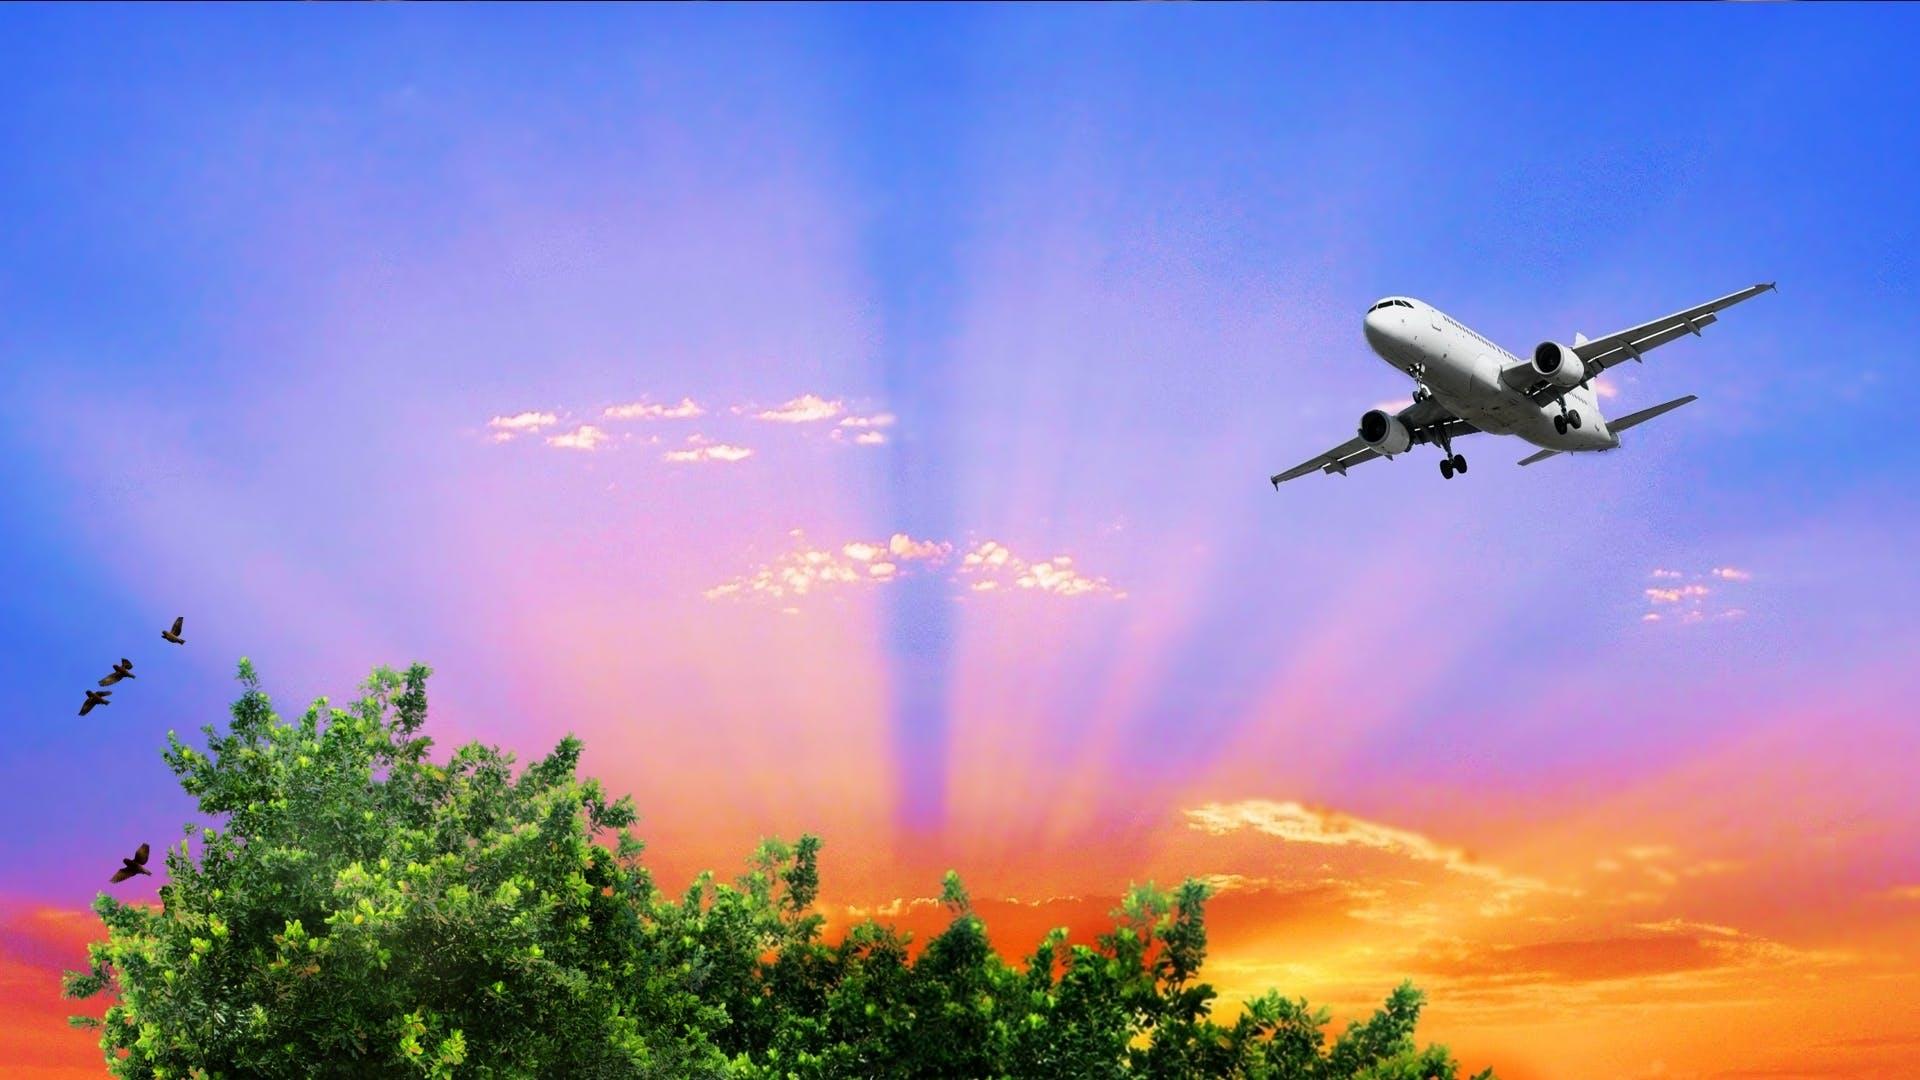 Free stock photo of avião, clouds, plant, sky